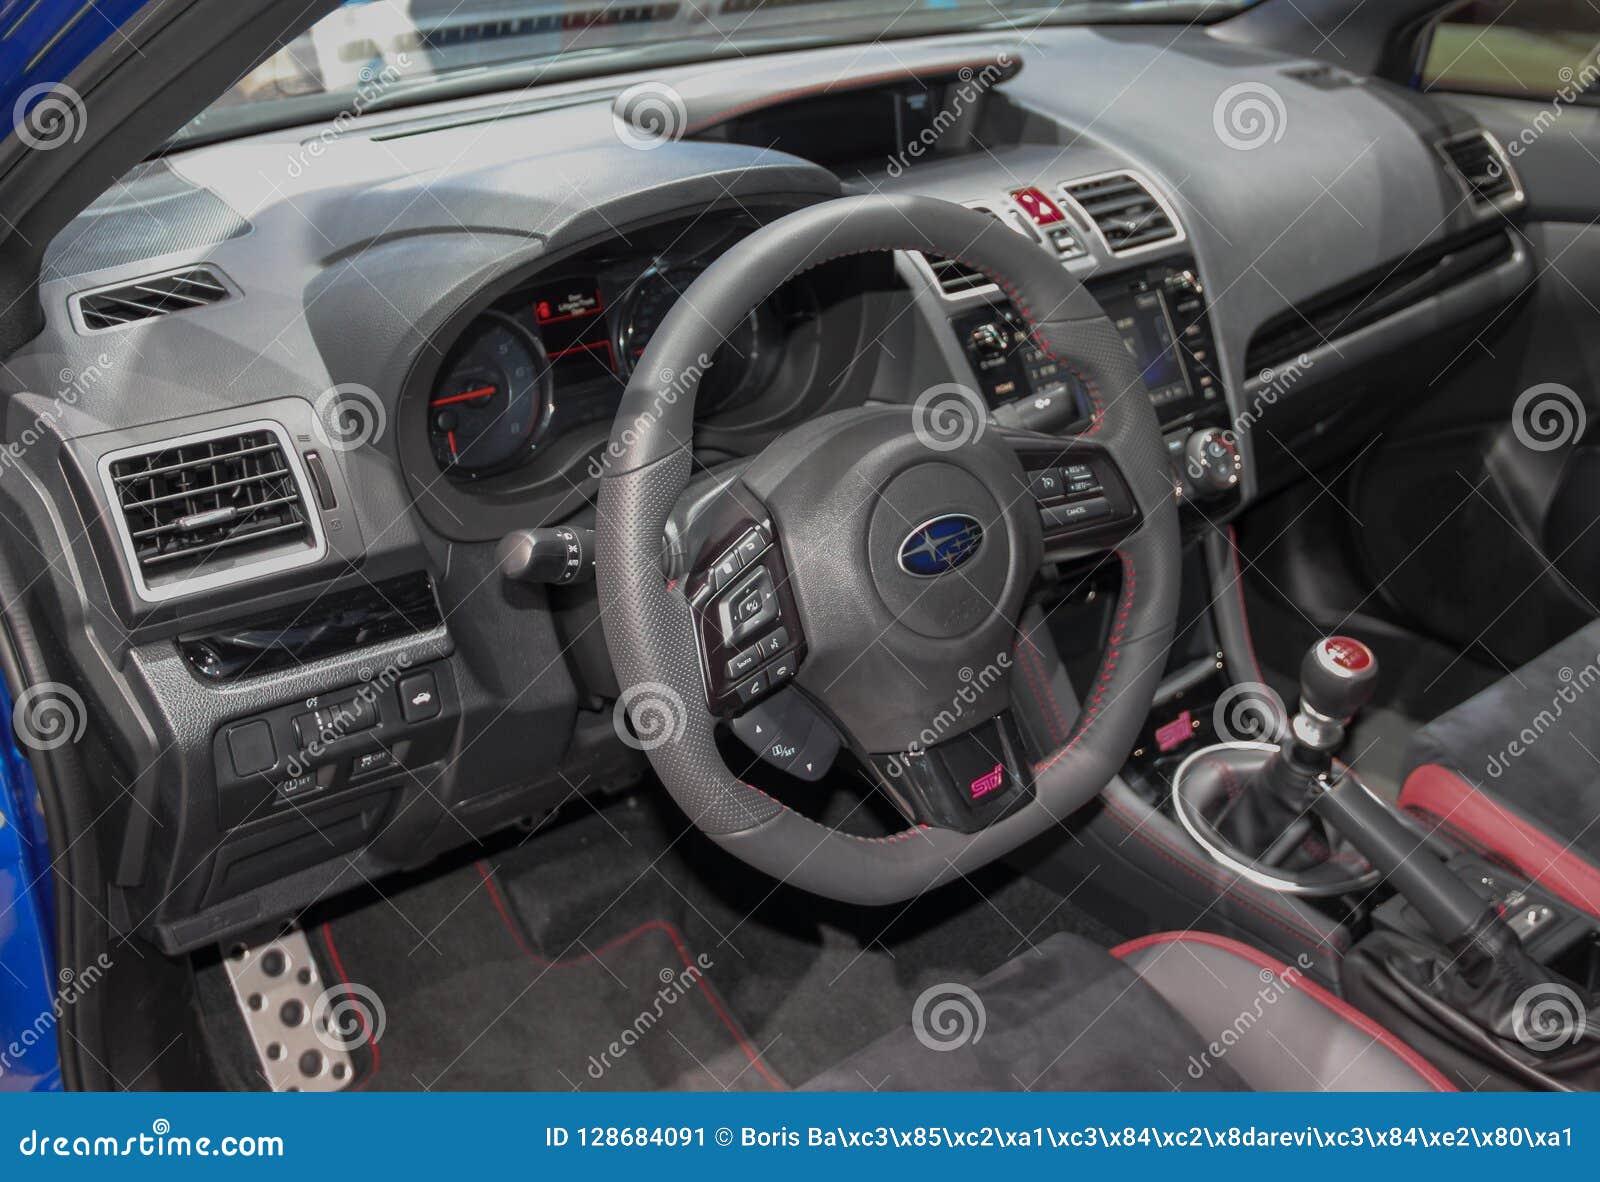 Switzerland Geneva March 8 2018 The Subaru Wrx Sti Interior The